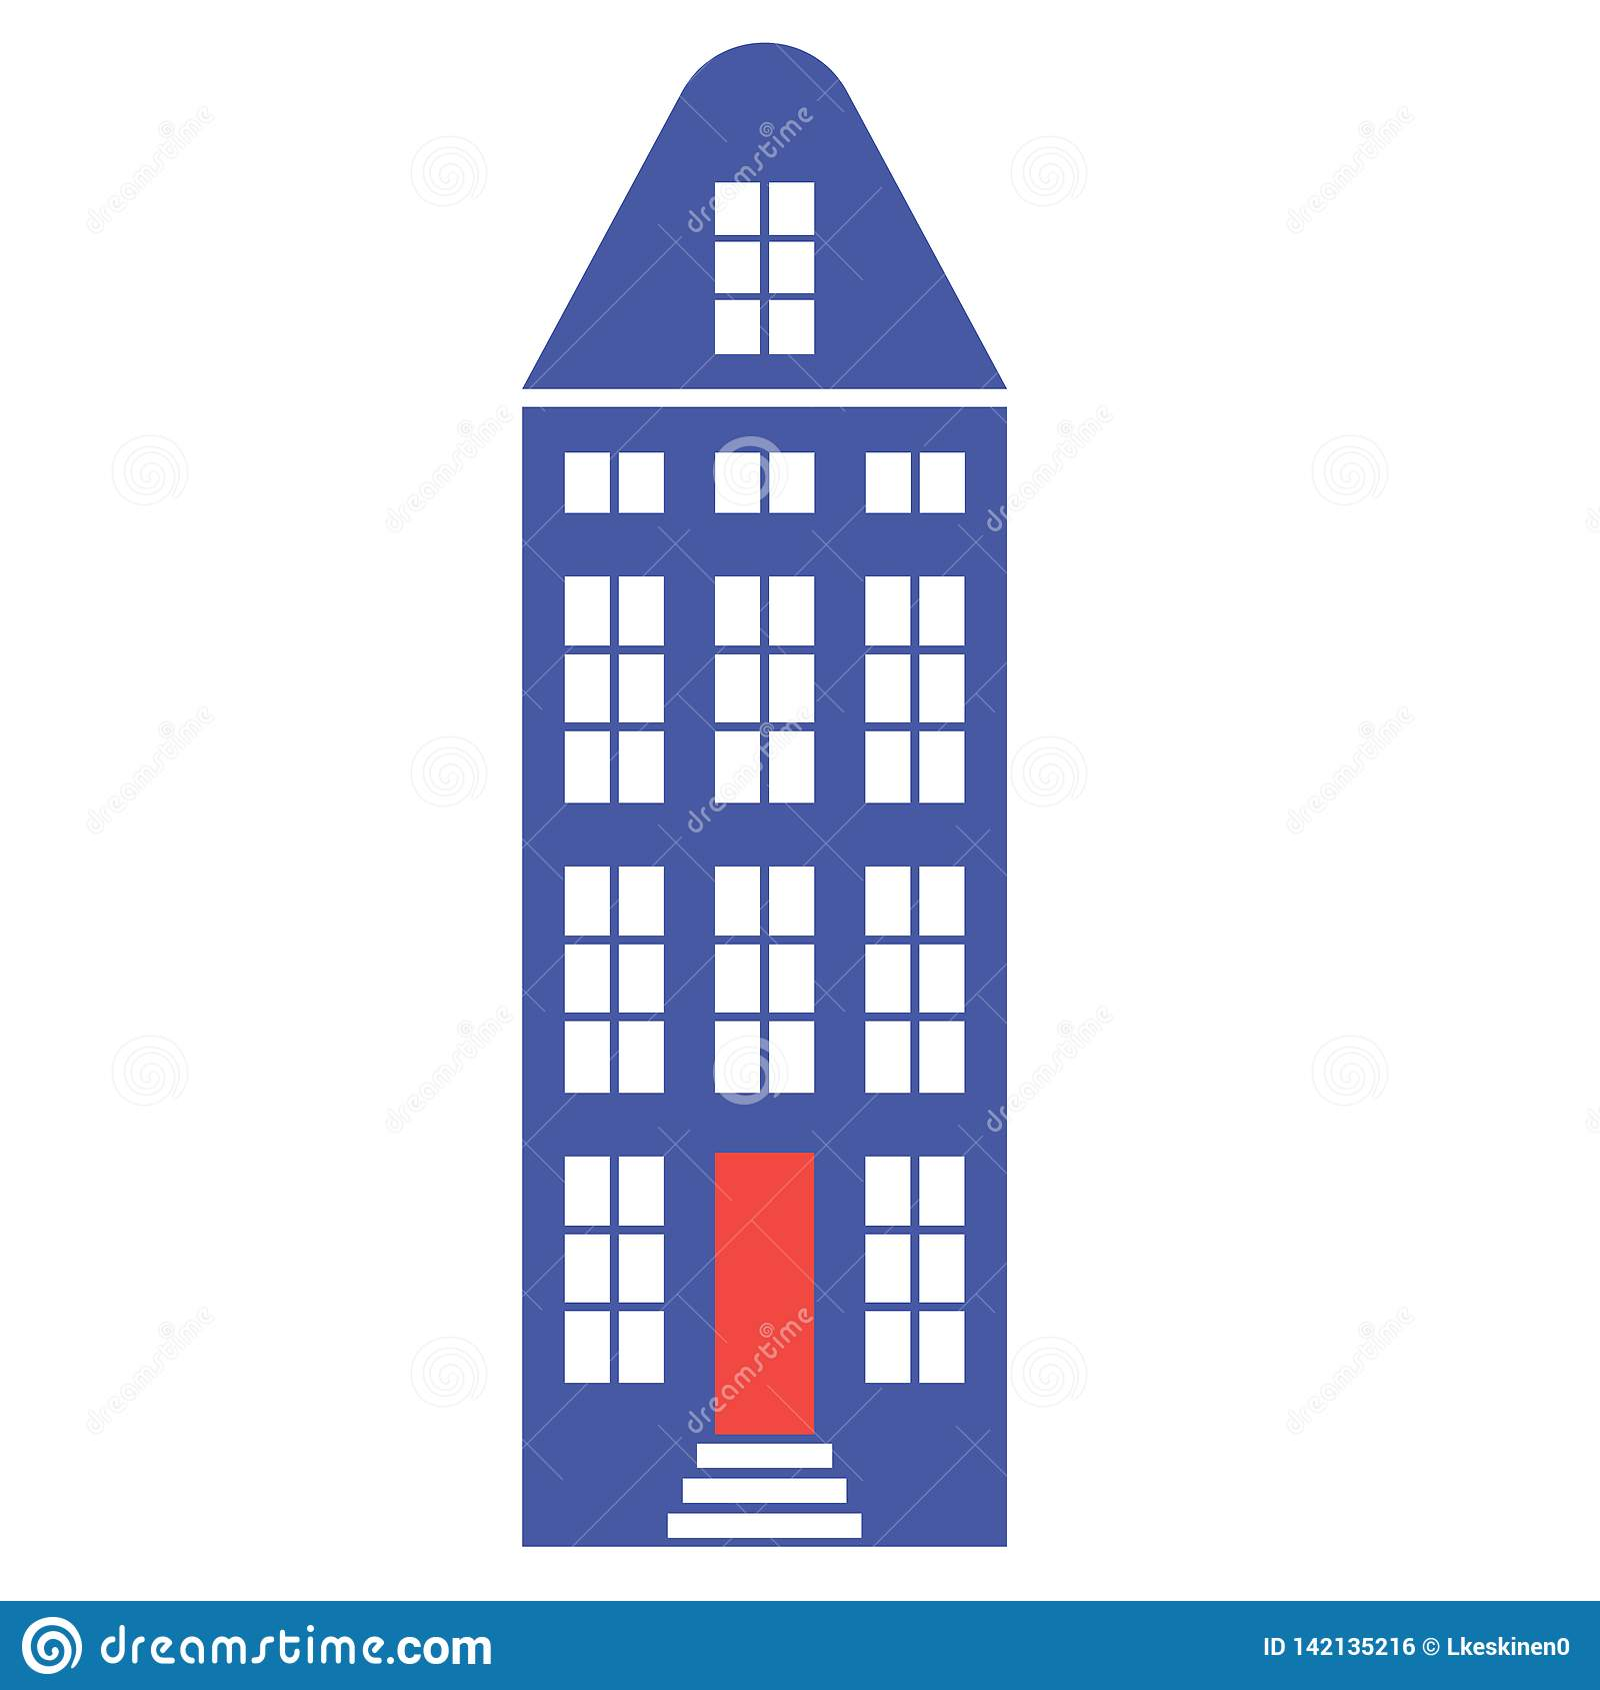 Amsterdam building flat color flat color illustration